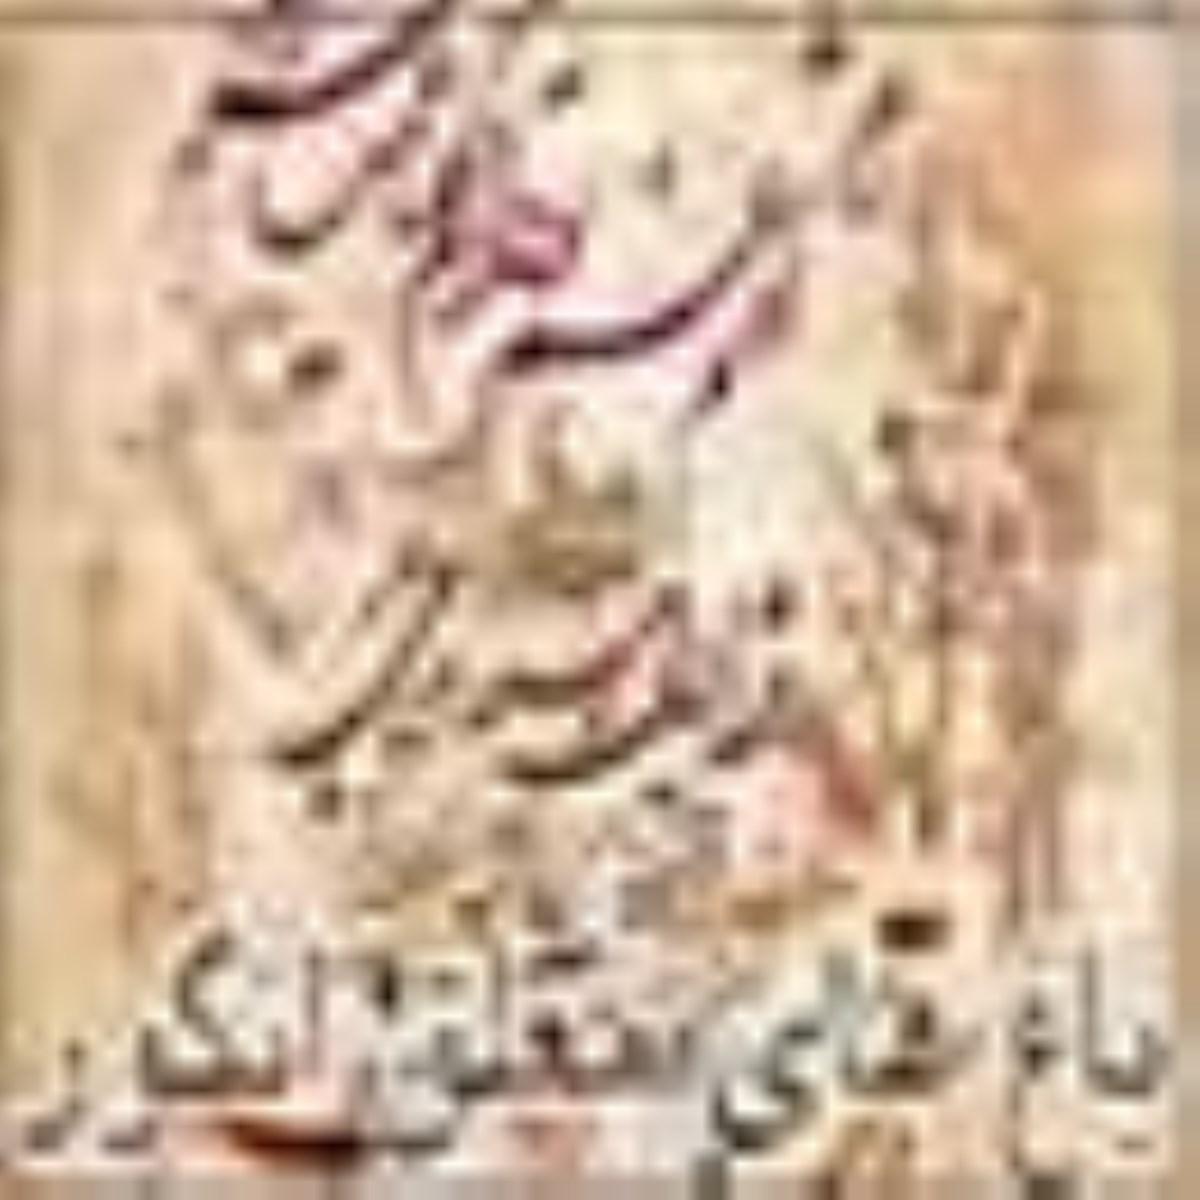 باغهاي معلق انگور ( مجموعه شعر)